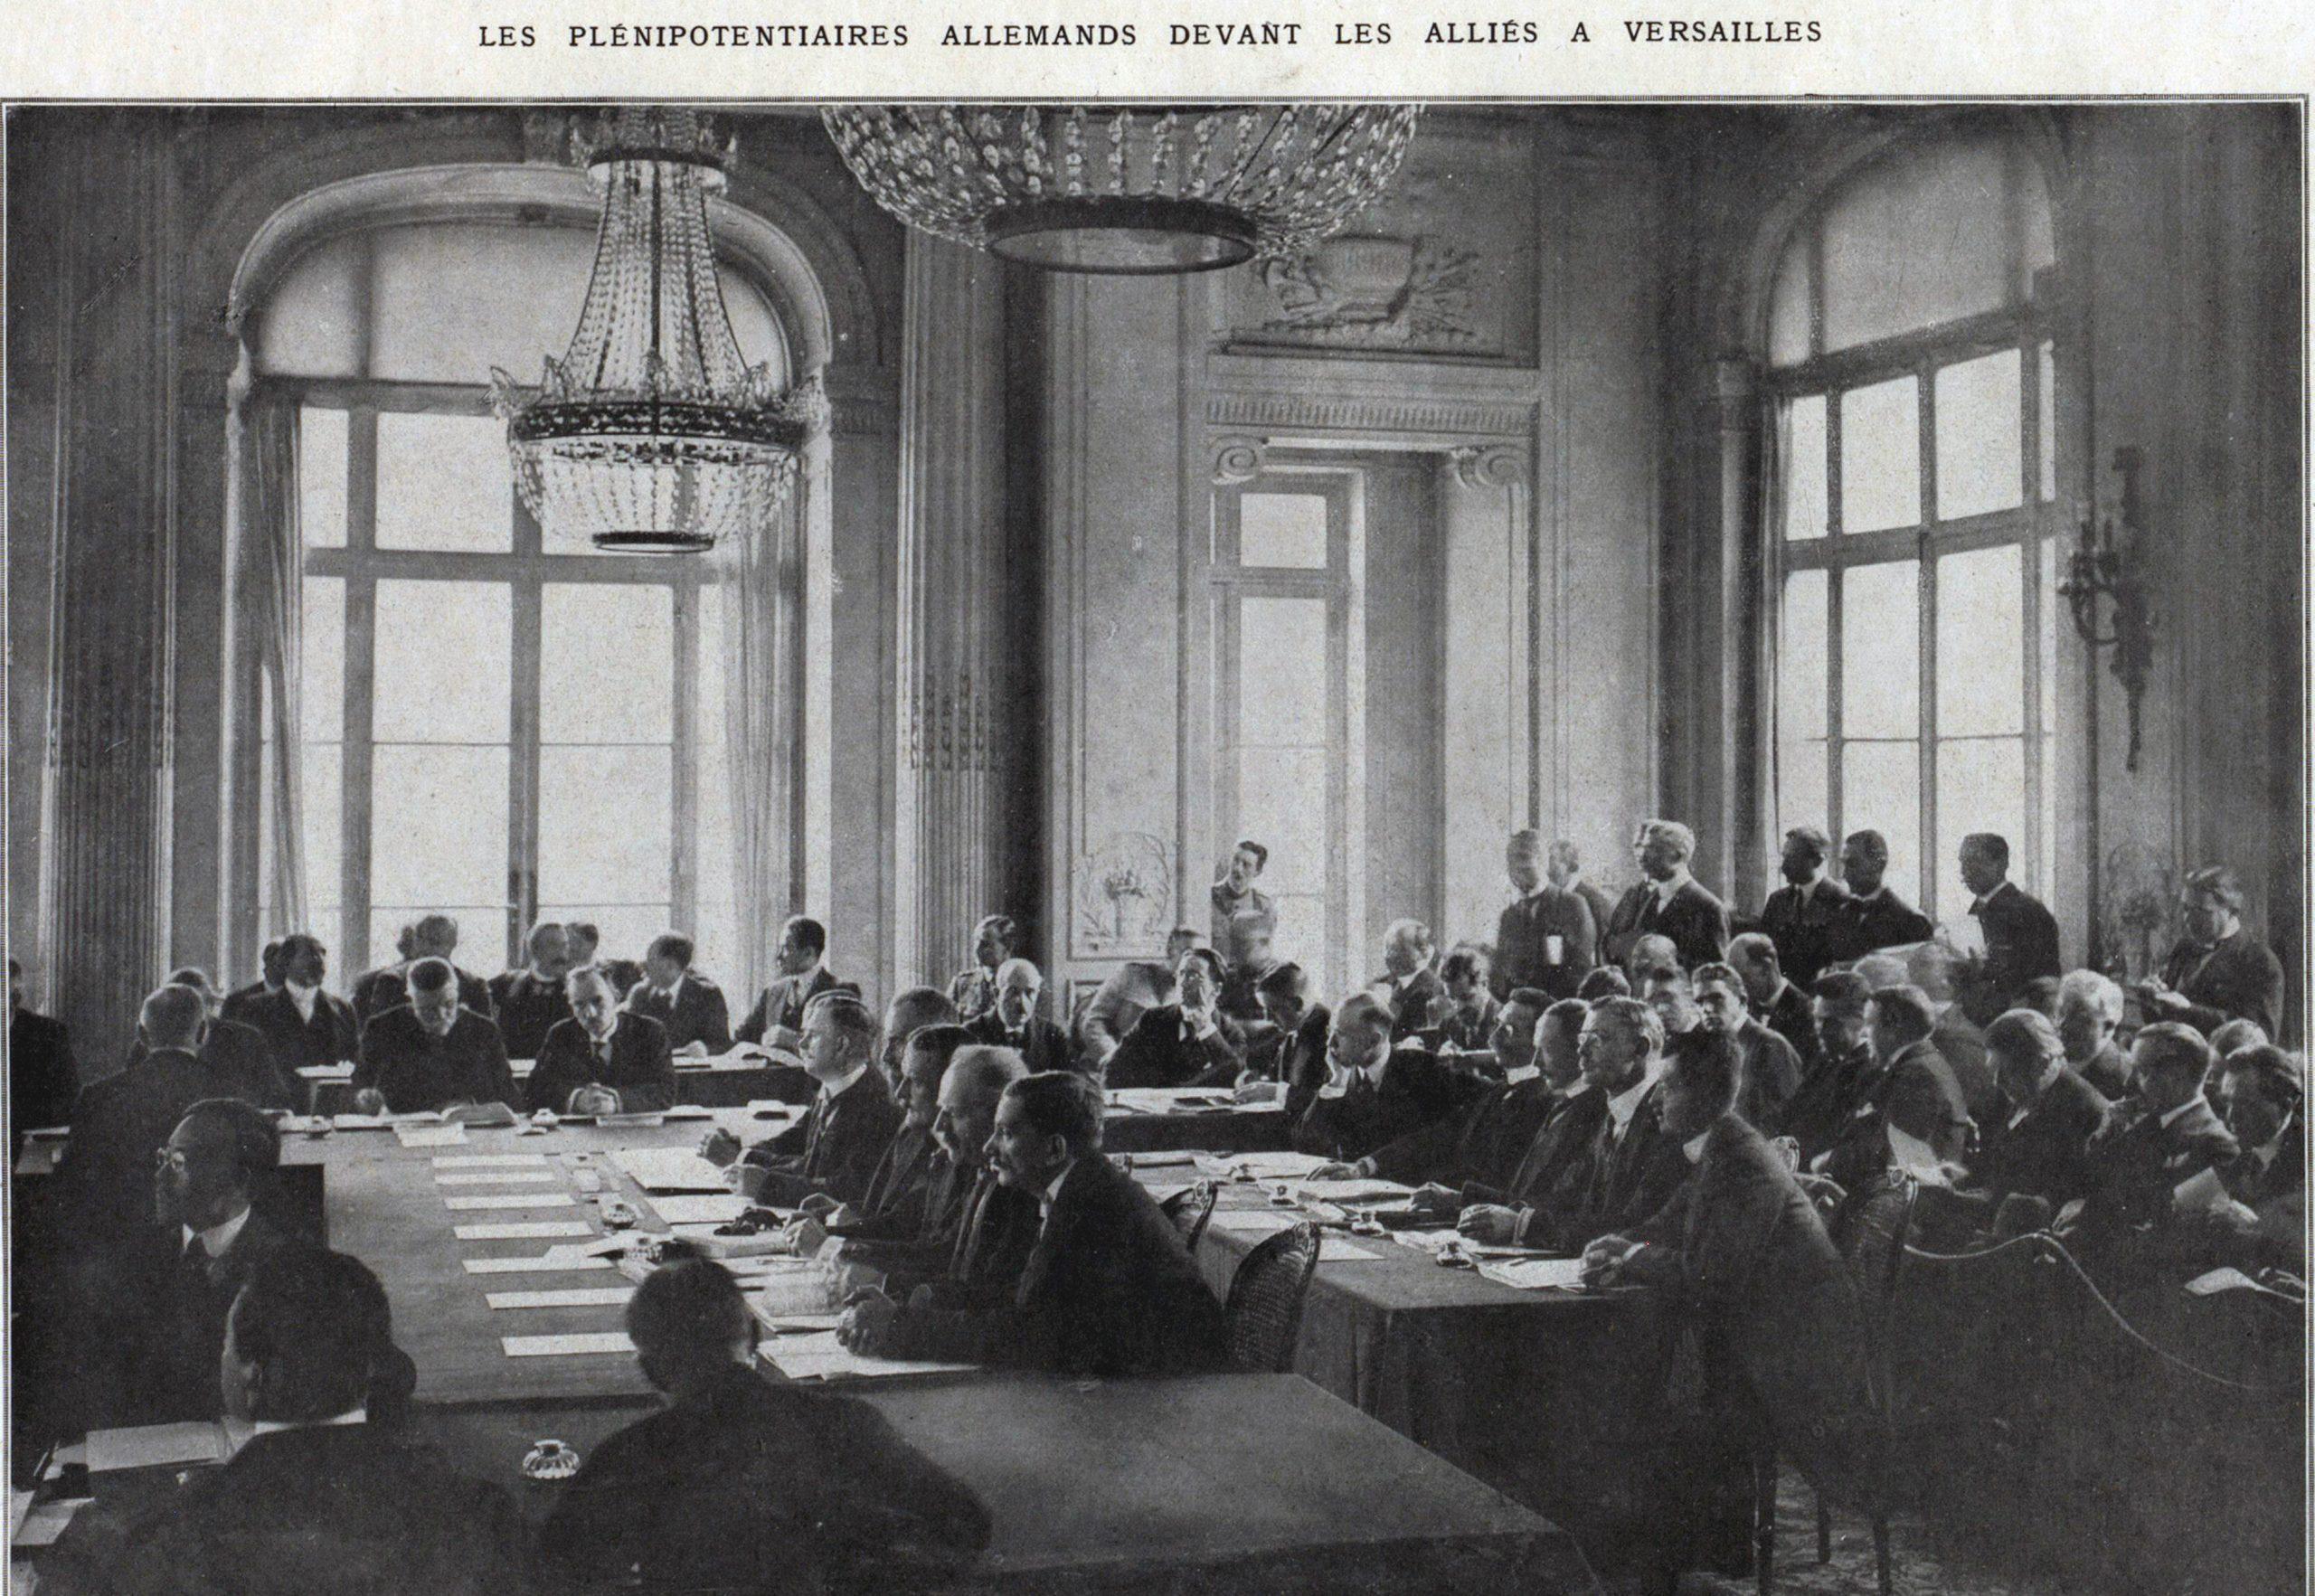 Plenipoterntiarii germani in fata aliatilor la Versailles